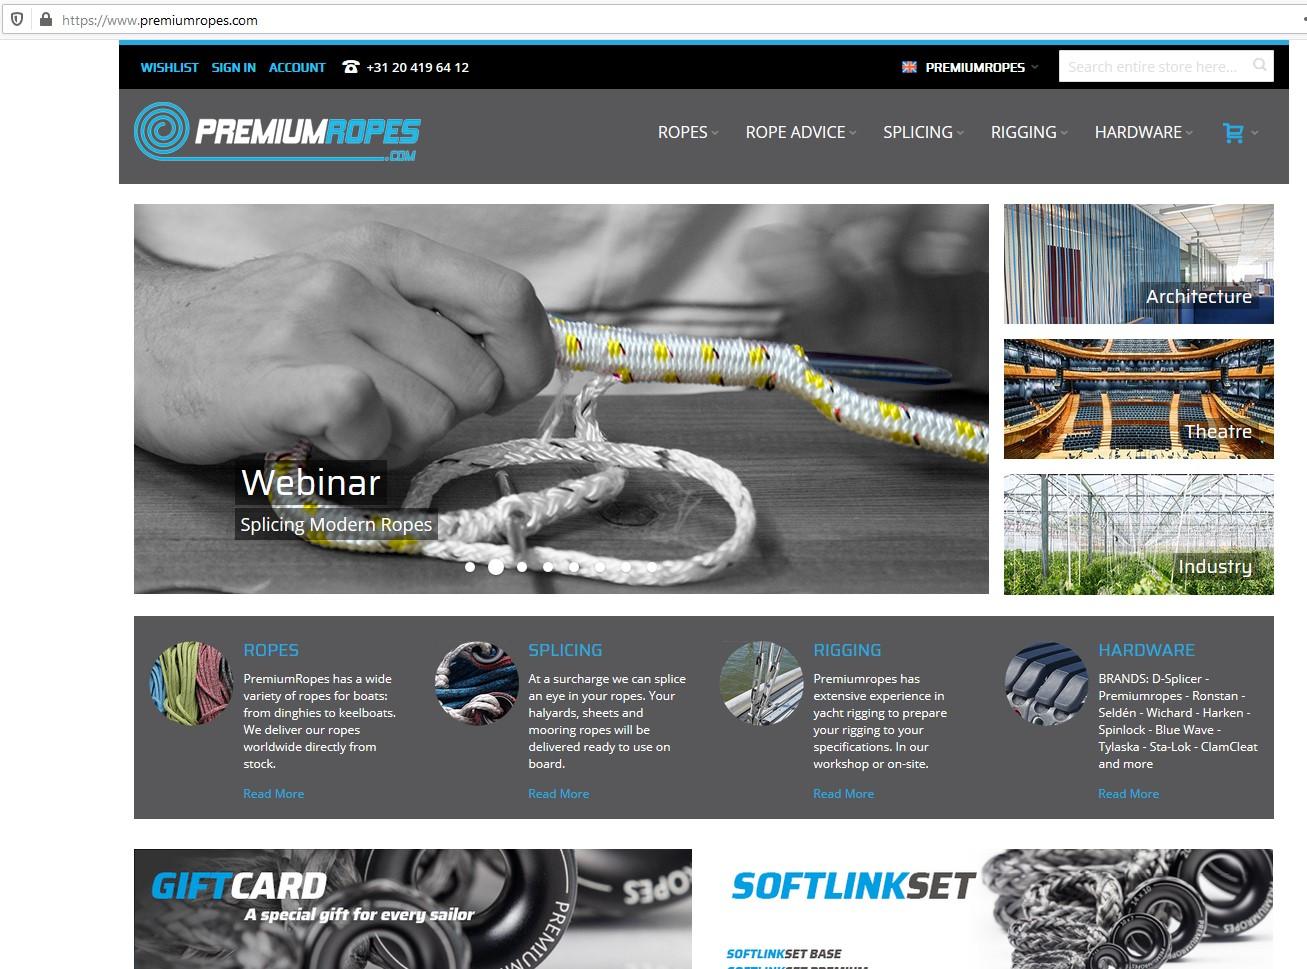 Online Presentation of Premium Ropes